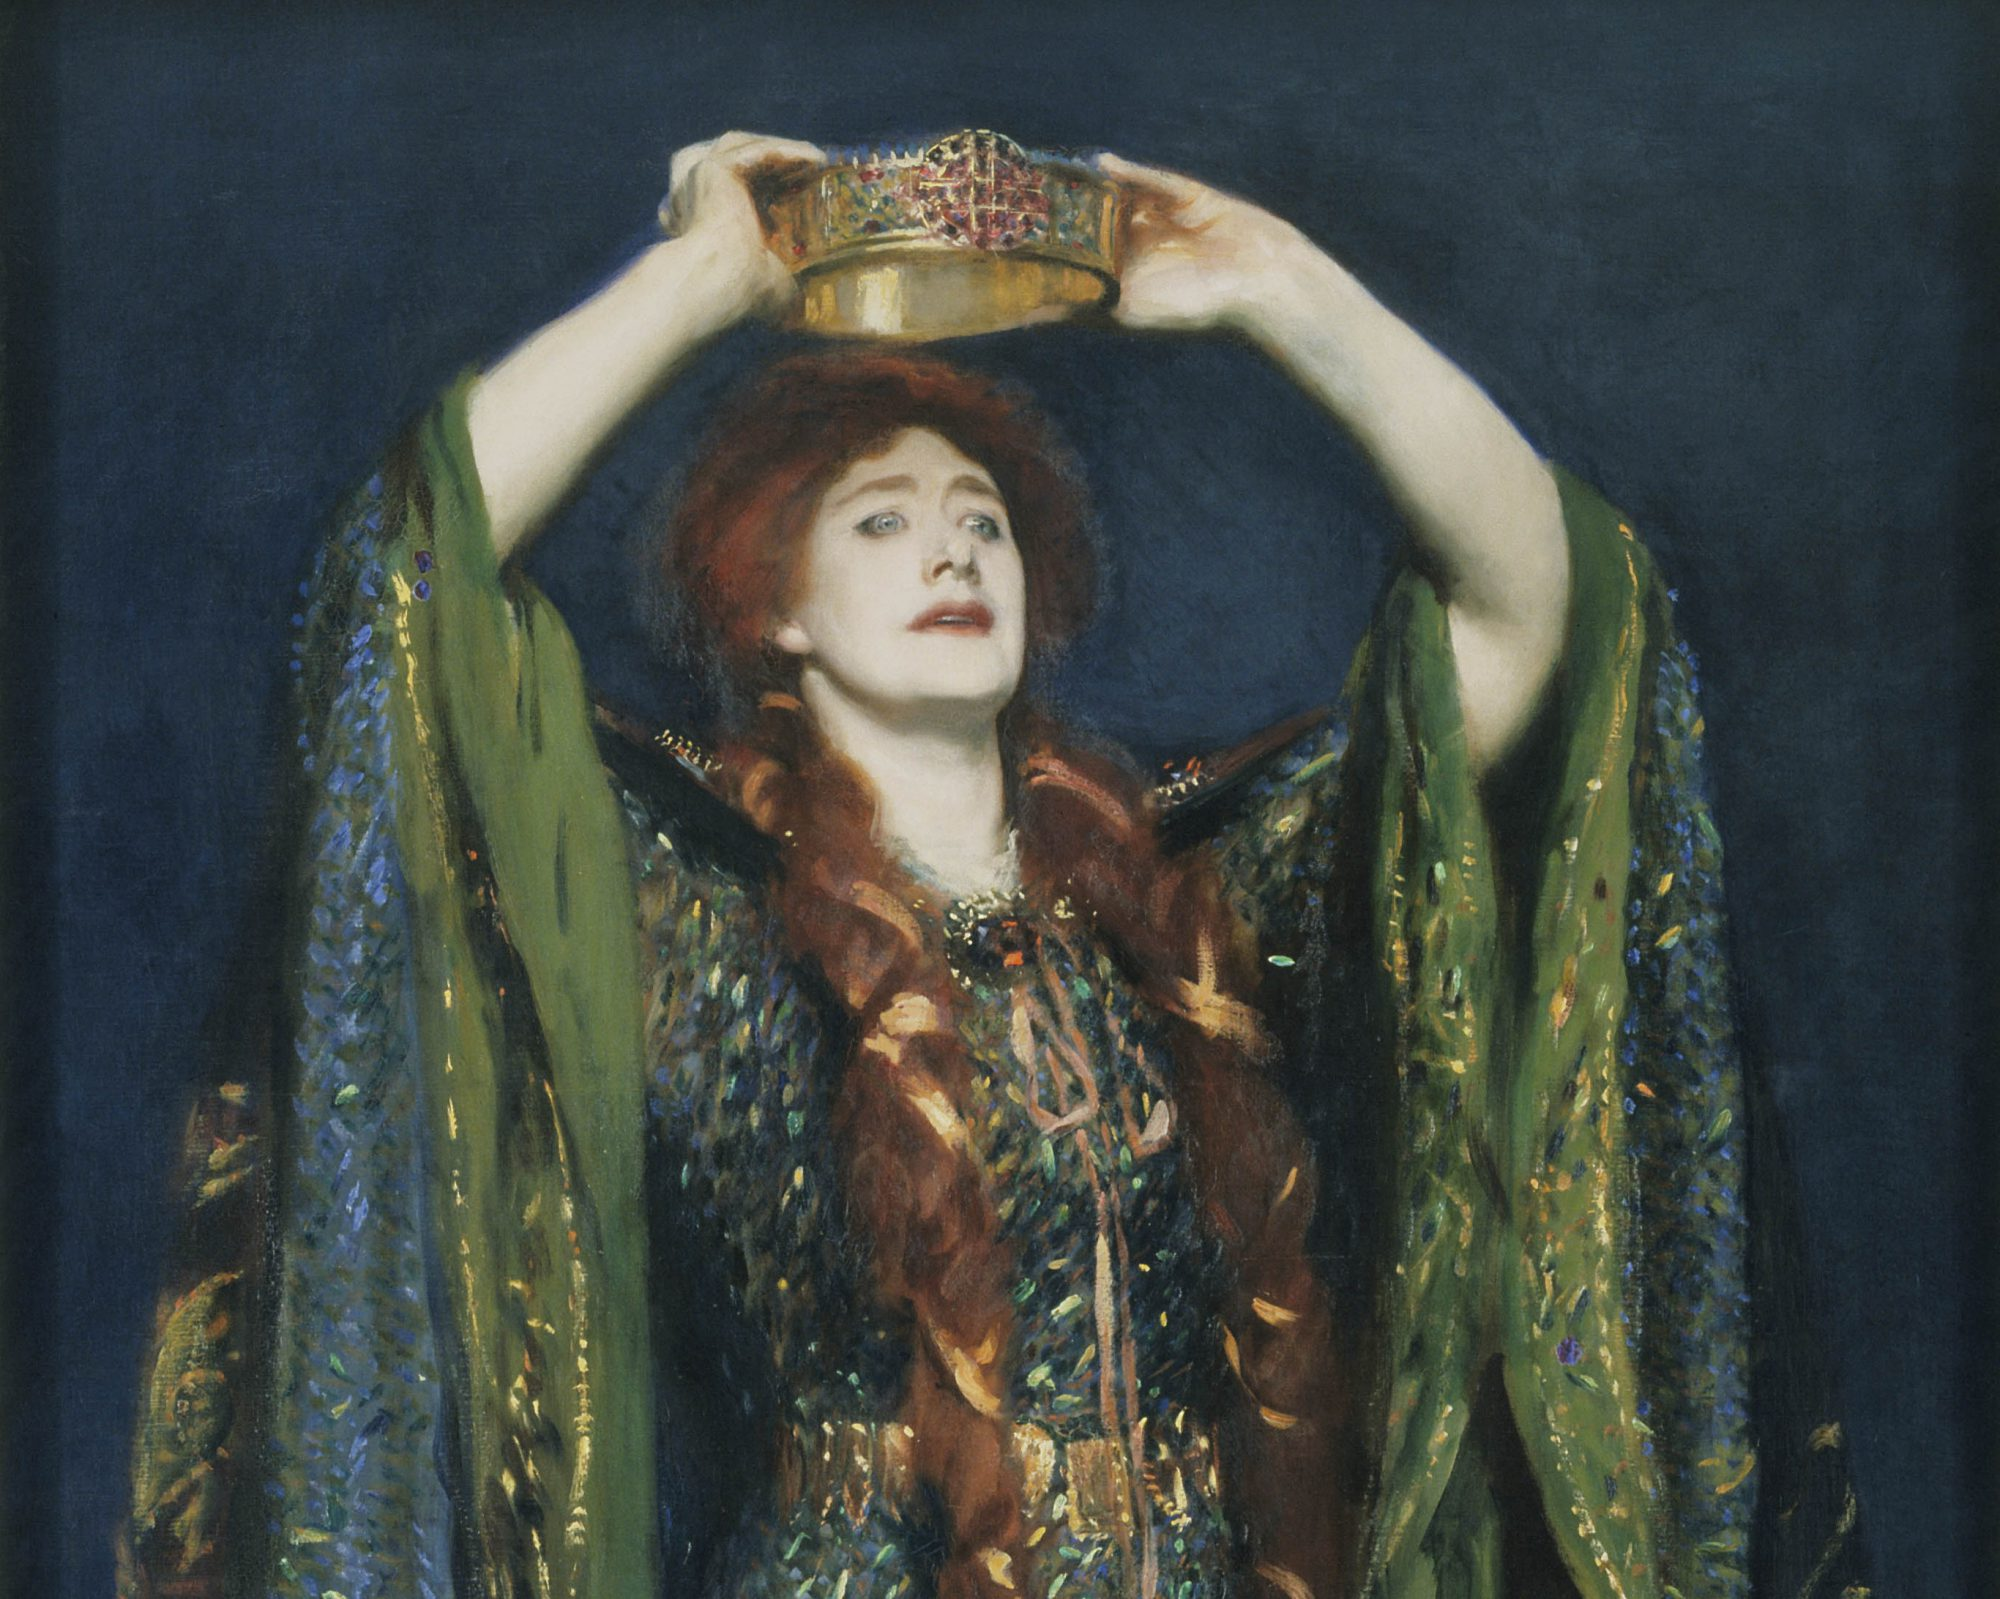 ohn Singer Sargent (1856-1925), Ellen Terry en Lady Macbeth, 1889. Tate Britain, Londres. © Tate, London 2016